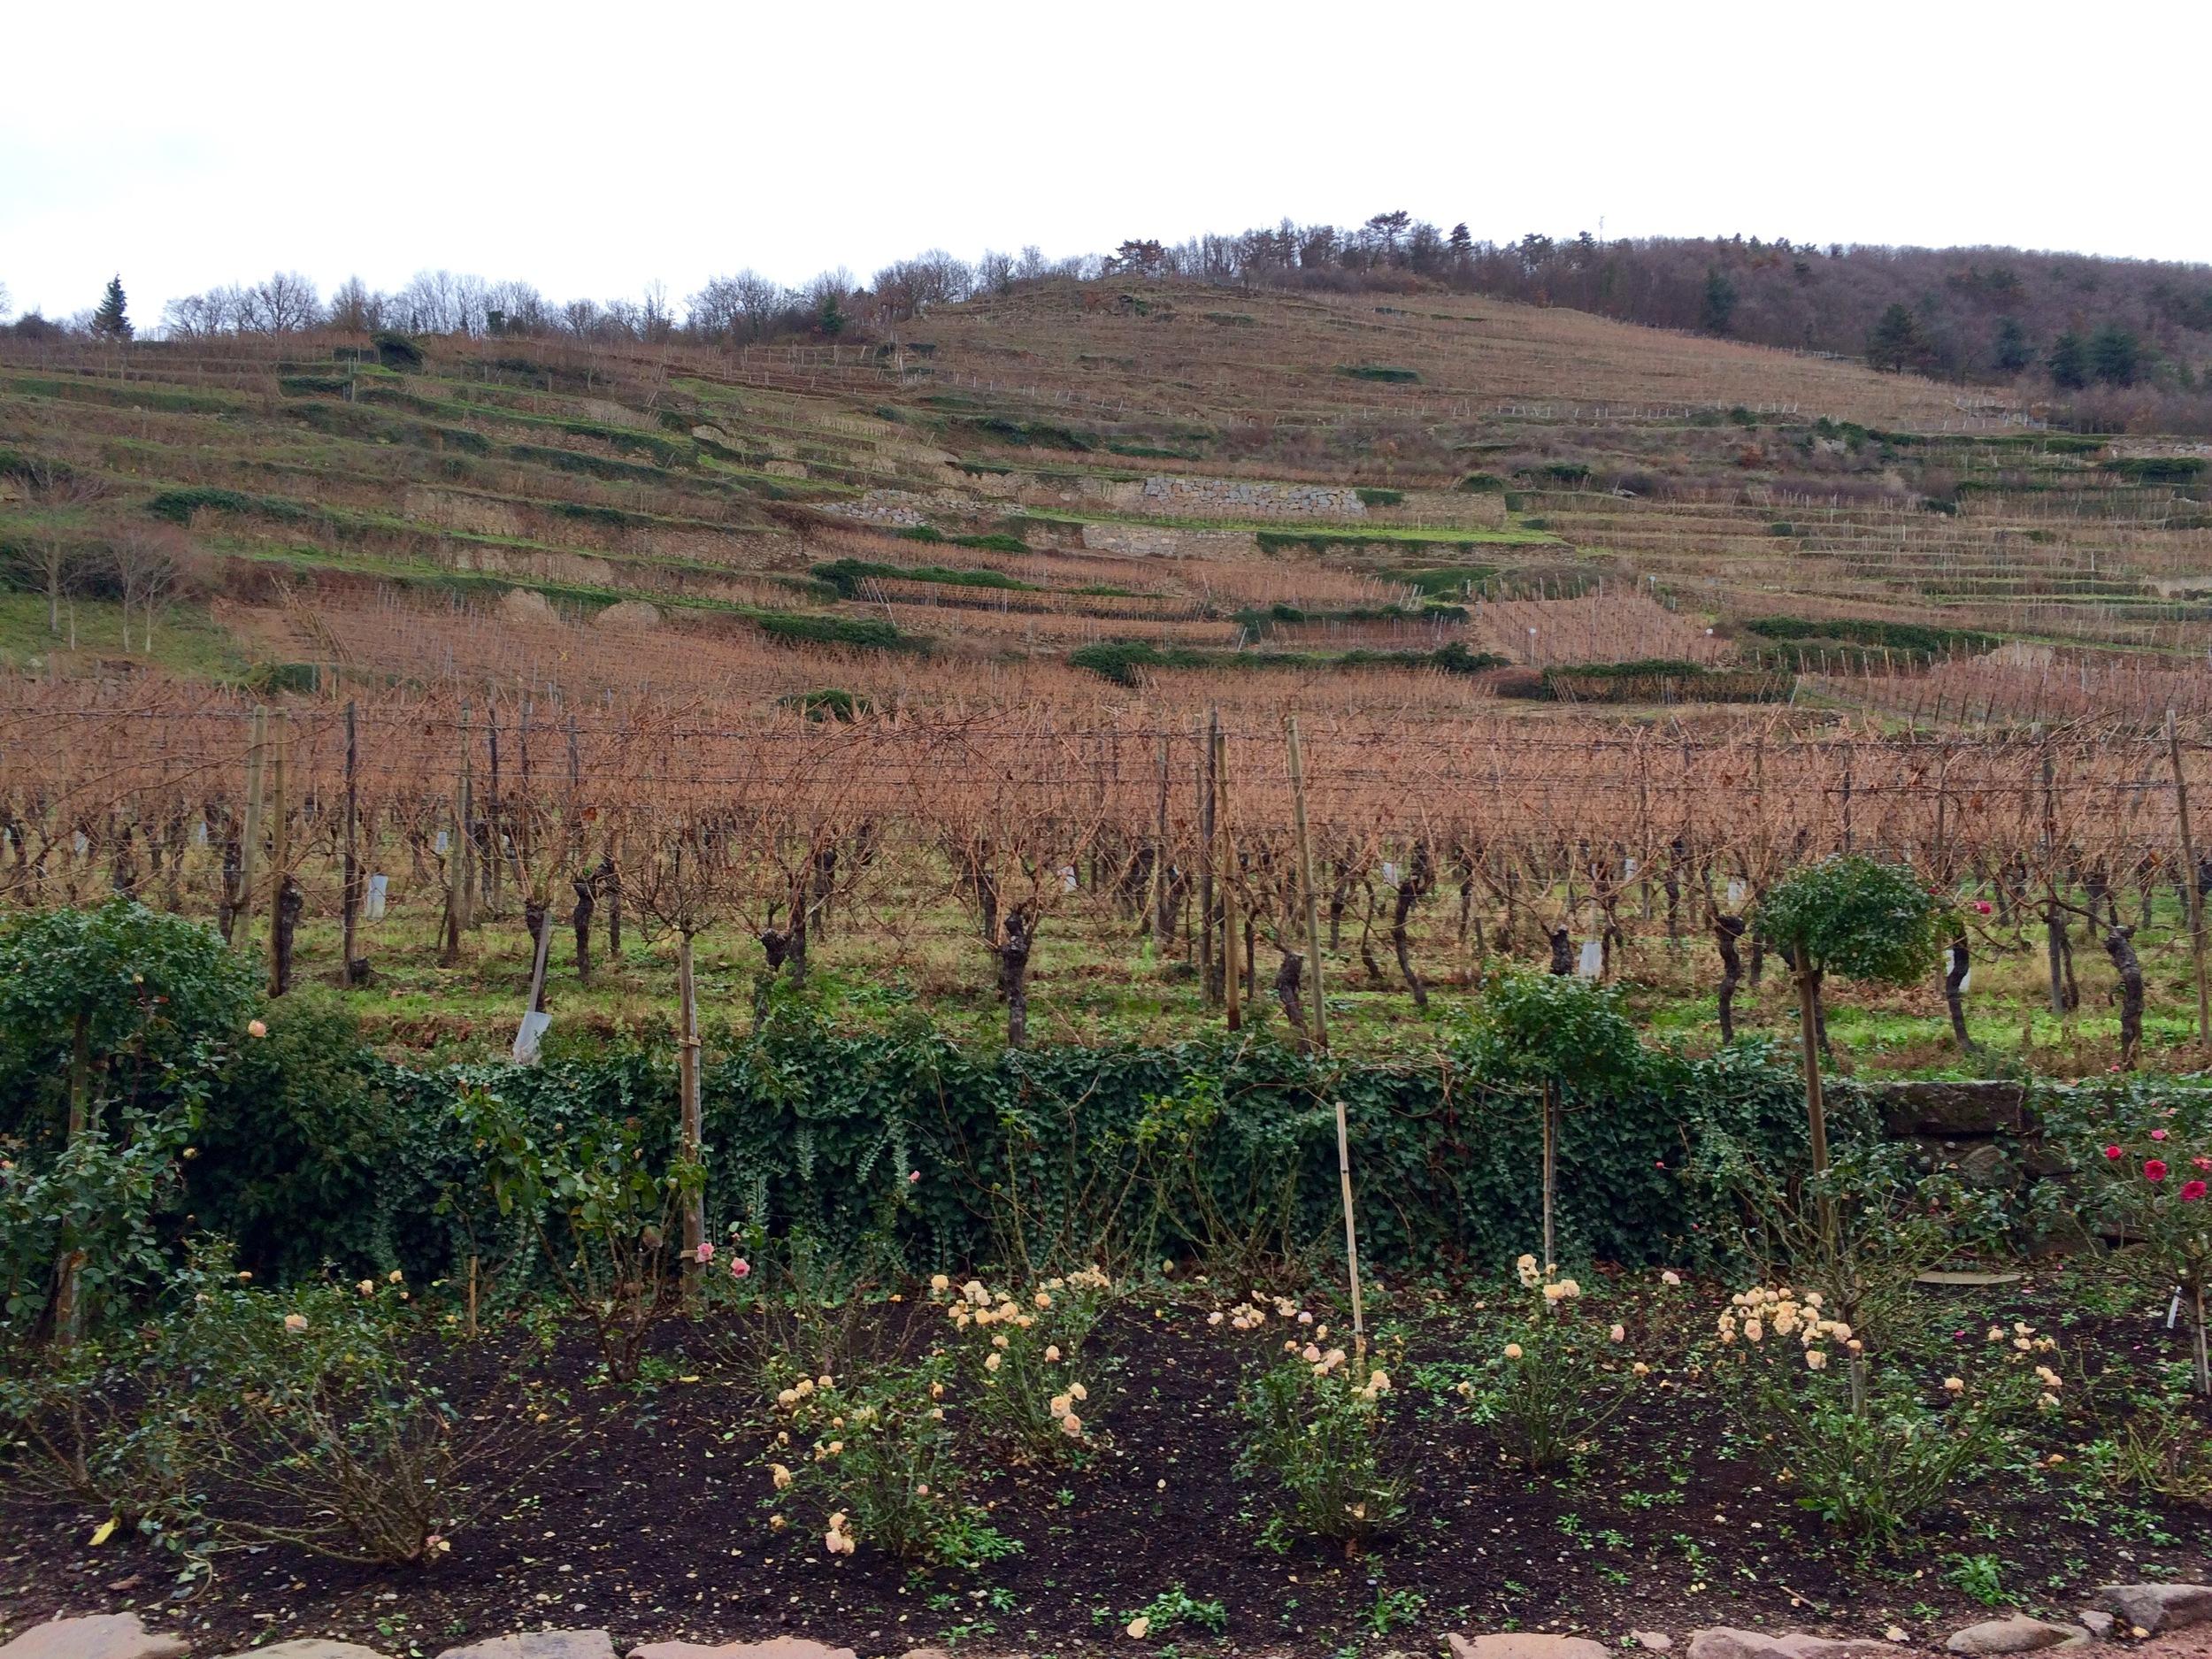 Vineyards at Kaysersberg, France